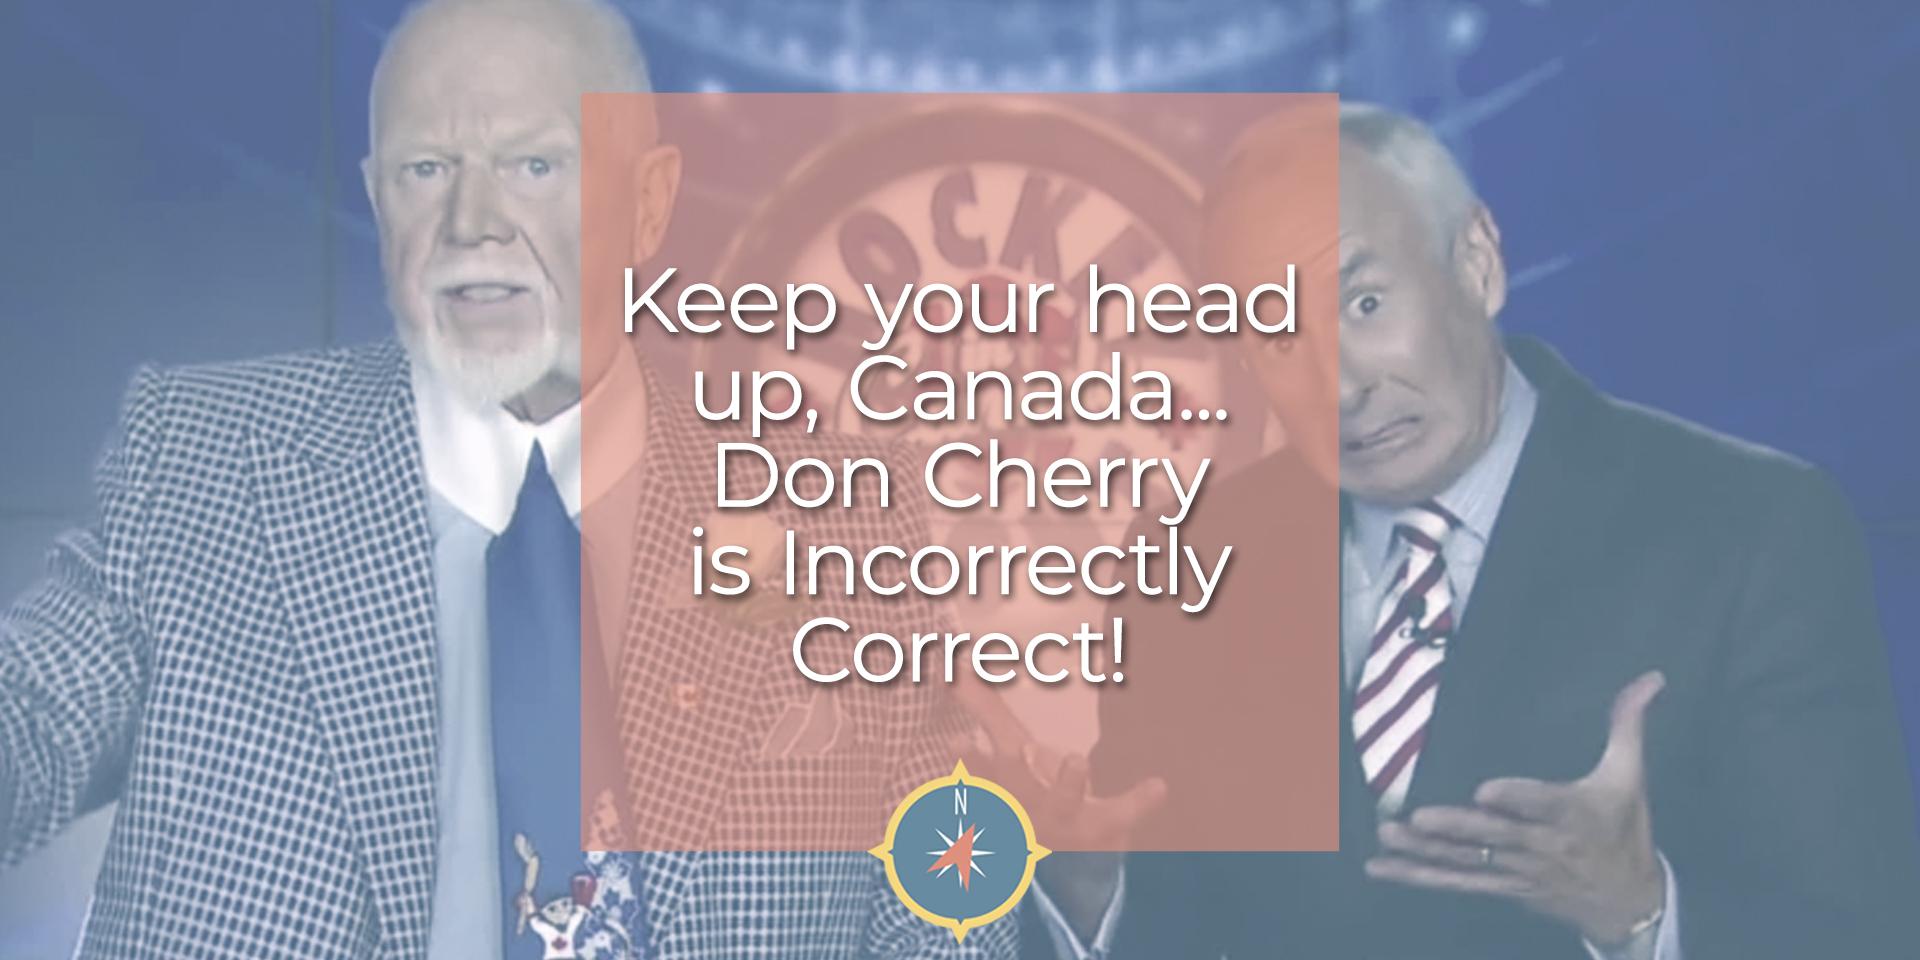 Don-Cherry-Incorrectly-Correct-Poppy-Free-Speech